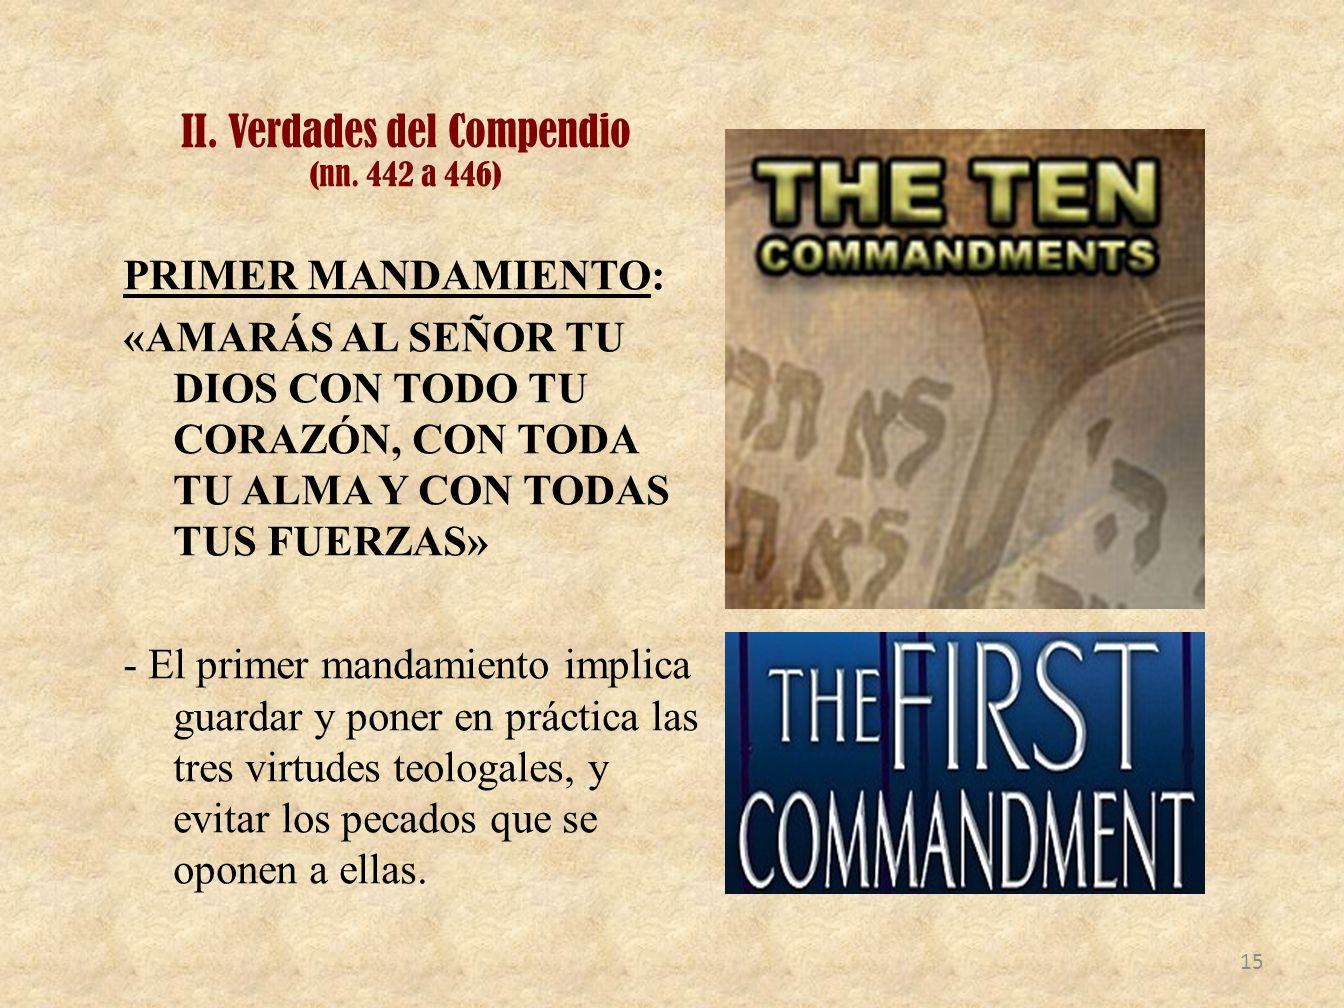 II. Verdades del Compendio (nn. 442 a 446)